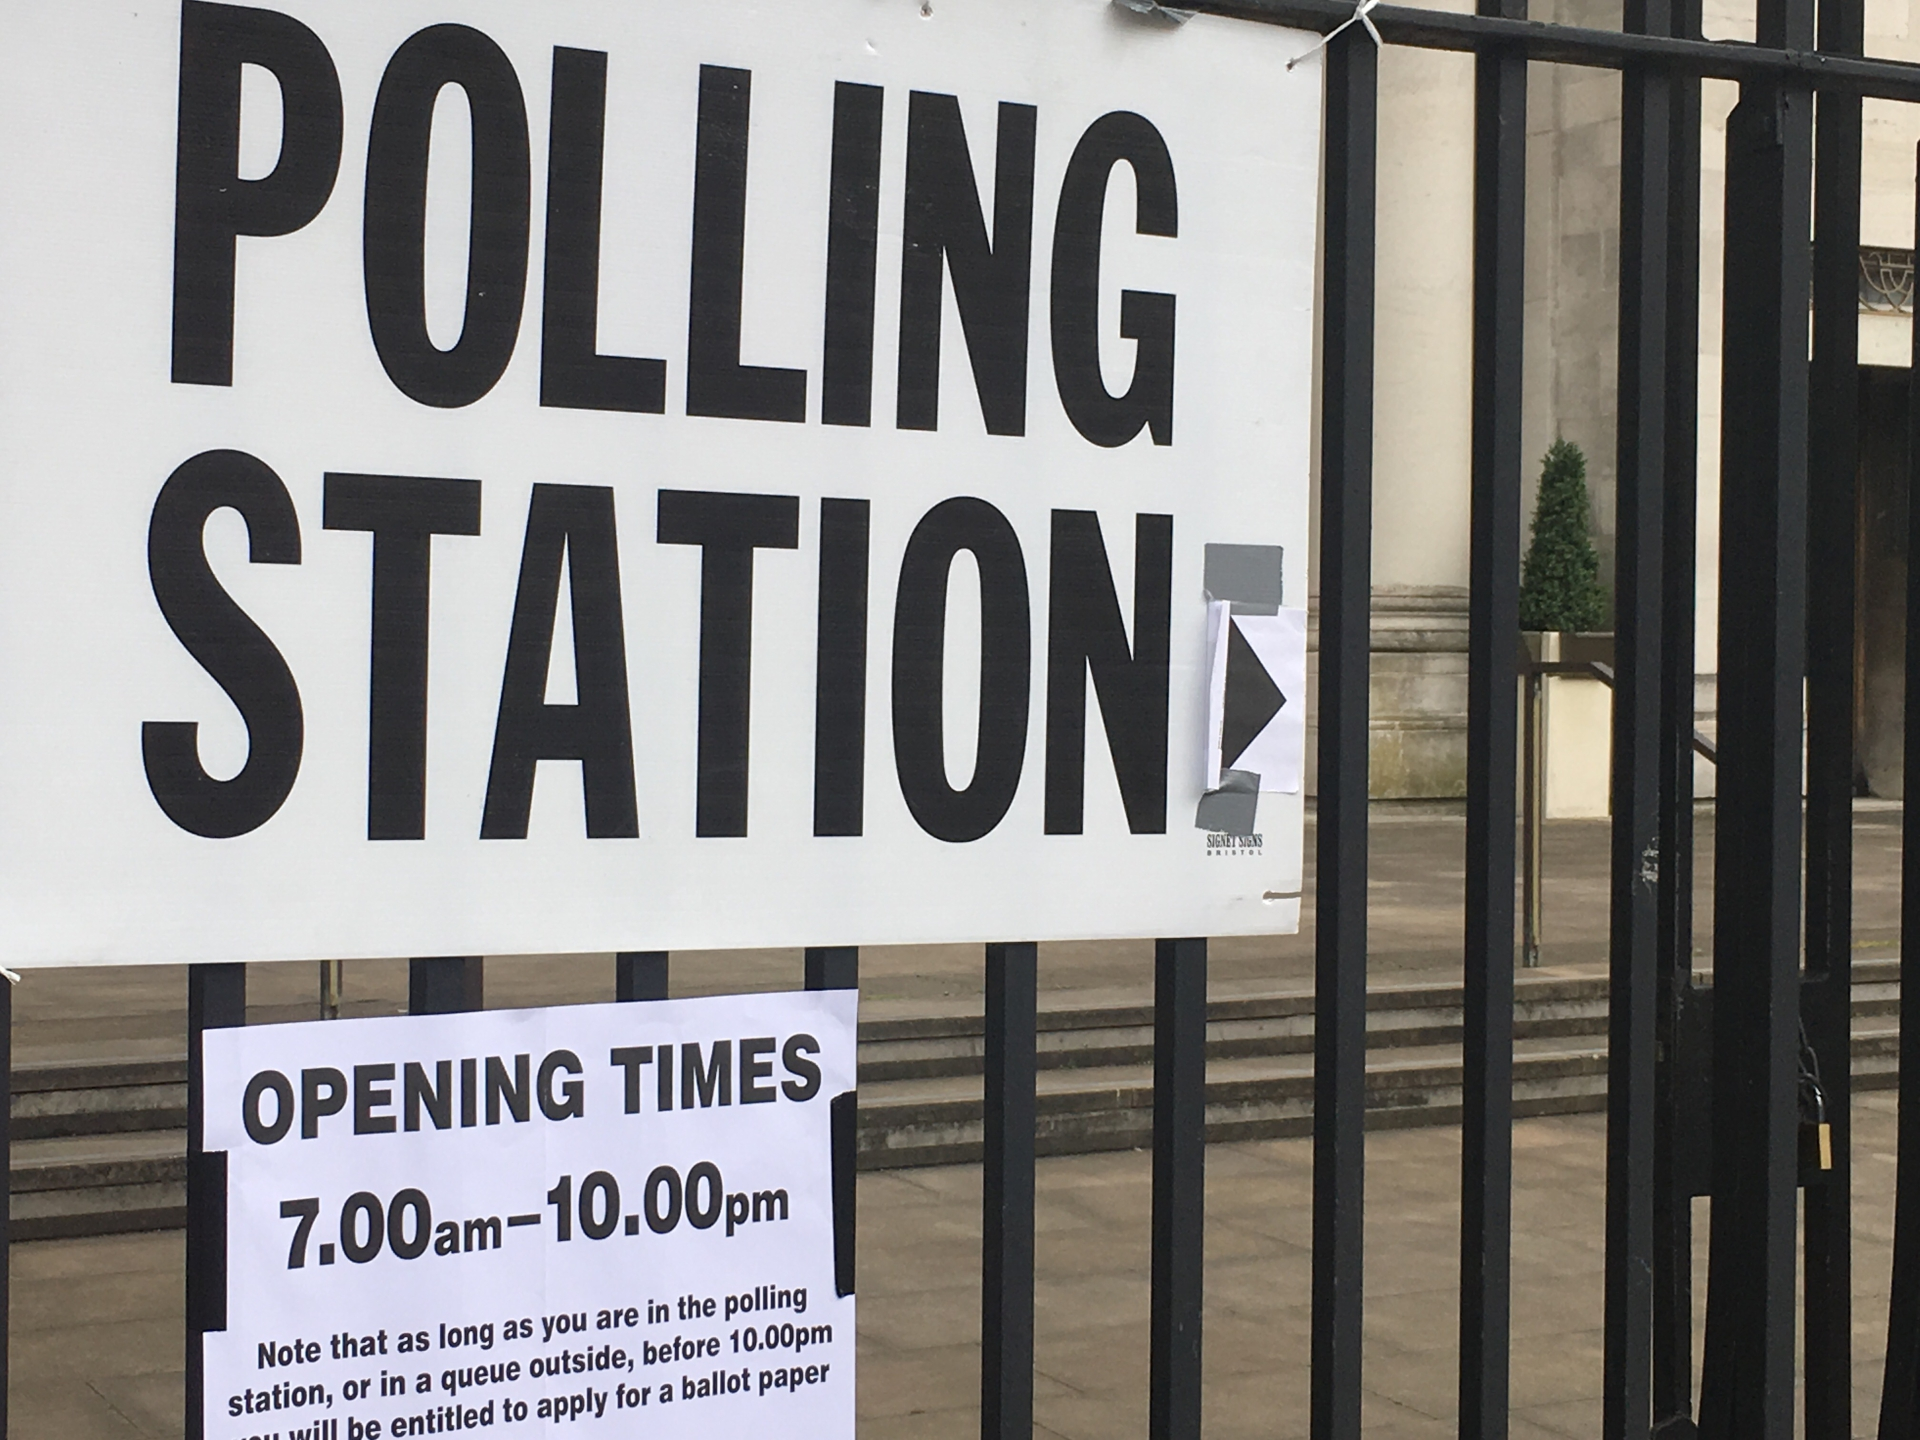 Elezioni inglesi: Theresa May perde consensi e seggi, Jeremy Corbyn ne guadagna